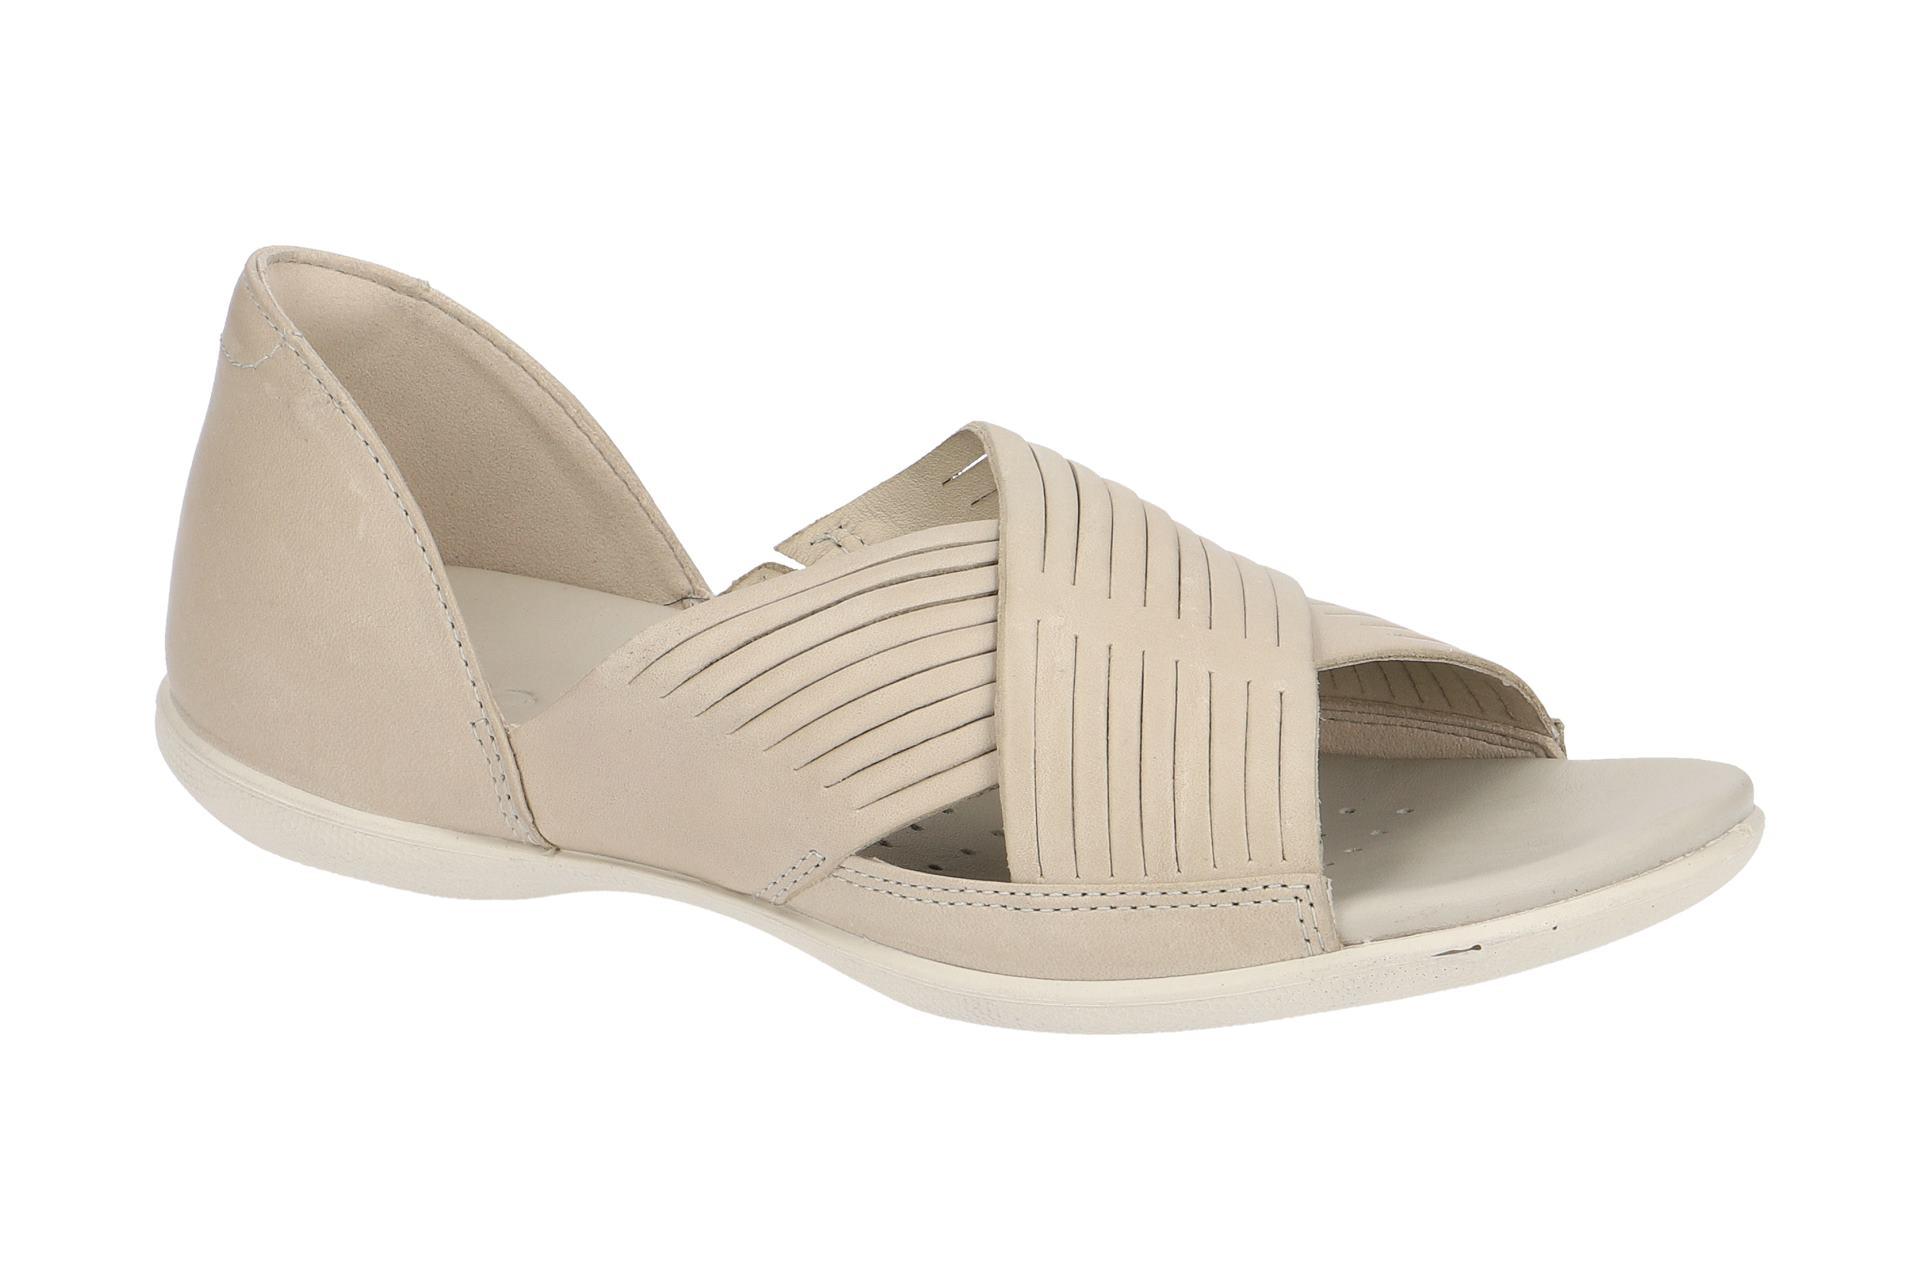 028a71f1b5e7bd Ecco Schuhe FLASH grau Damen Sandale Sandaletten 24390302163 NEU